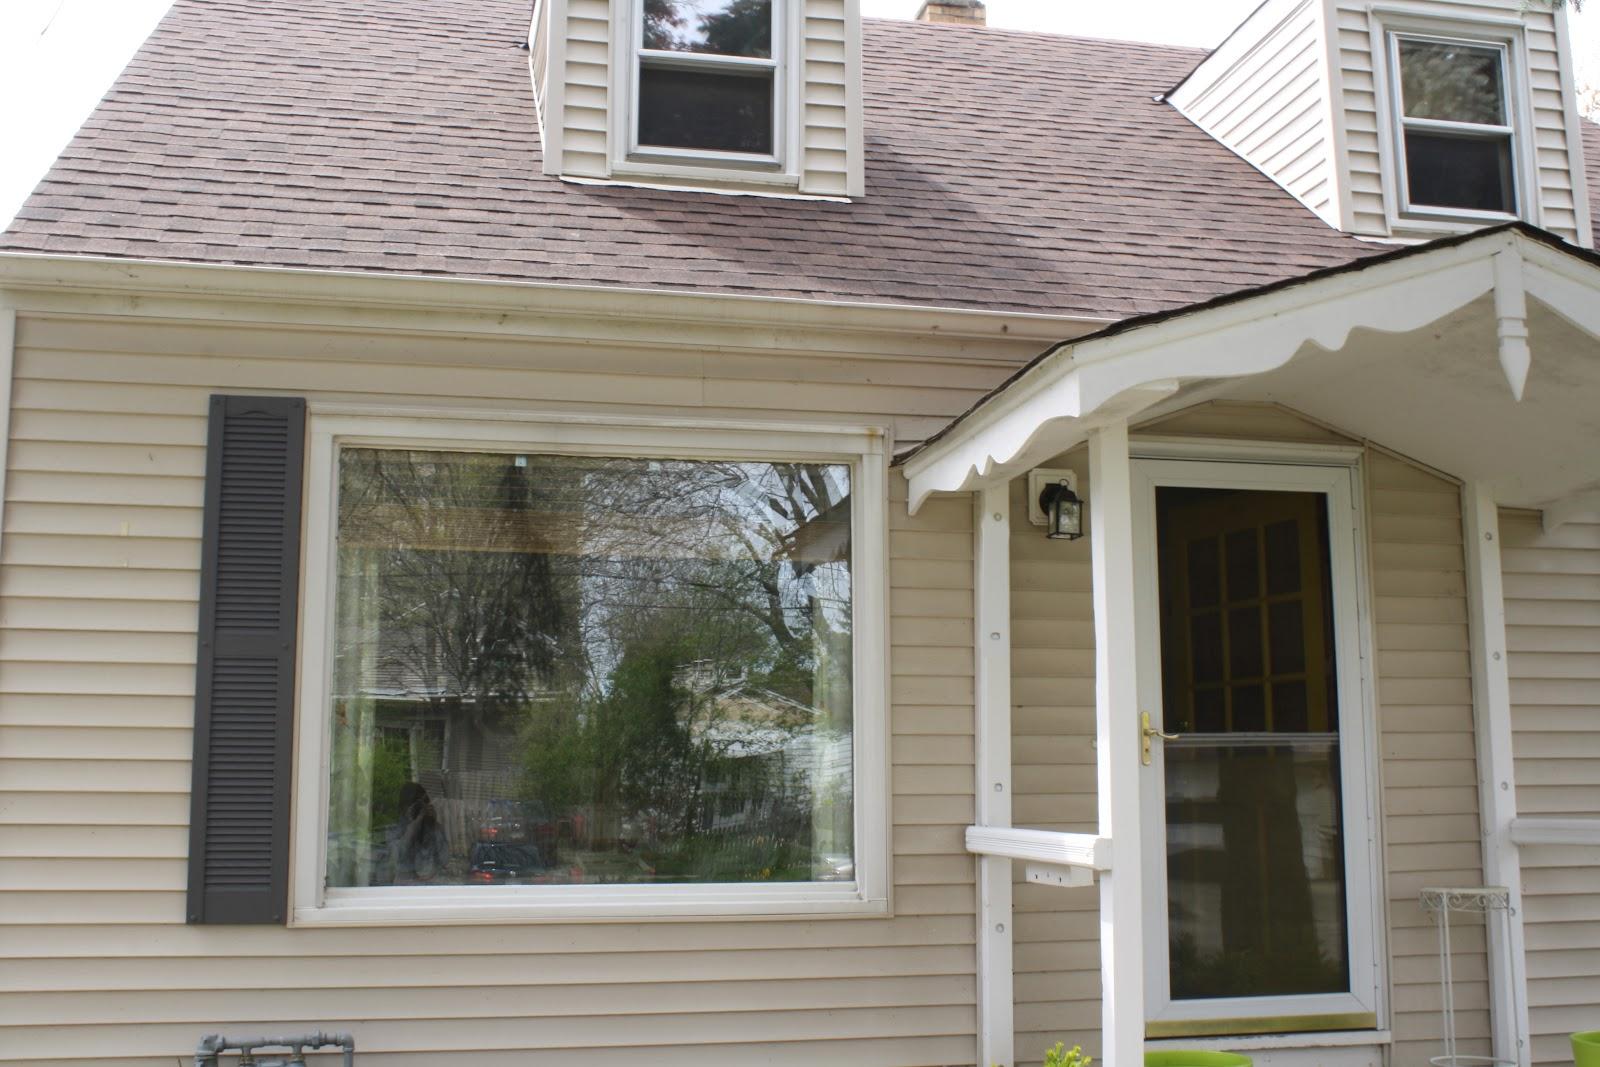 all side windows